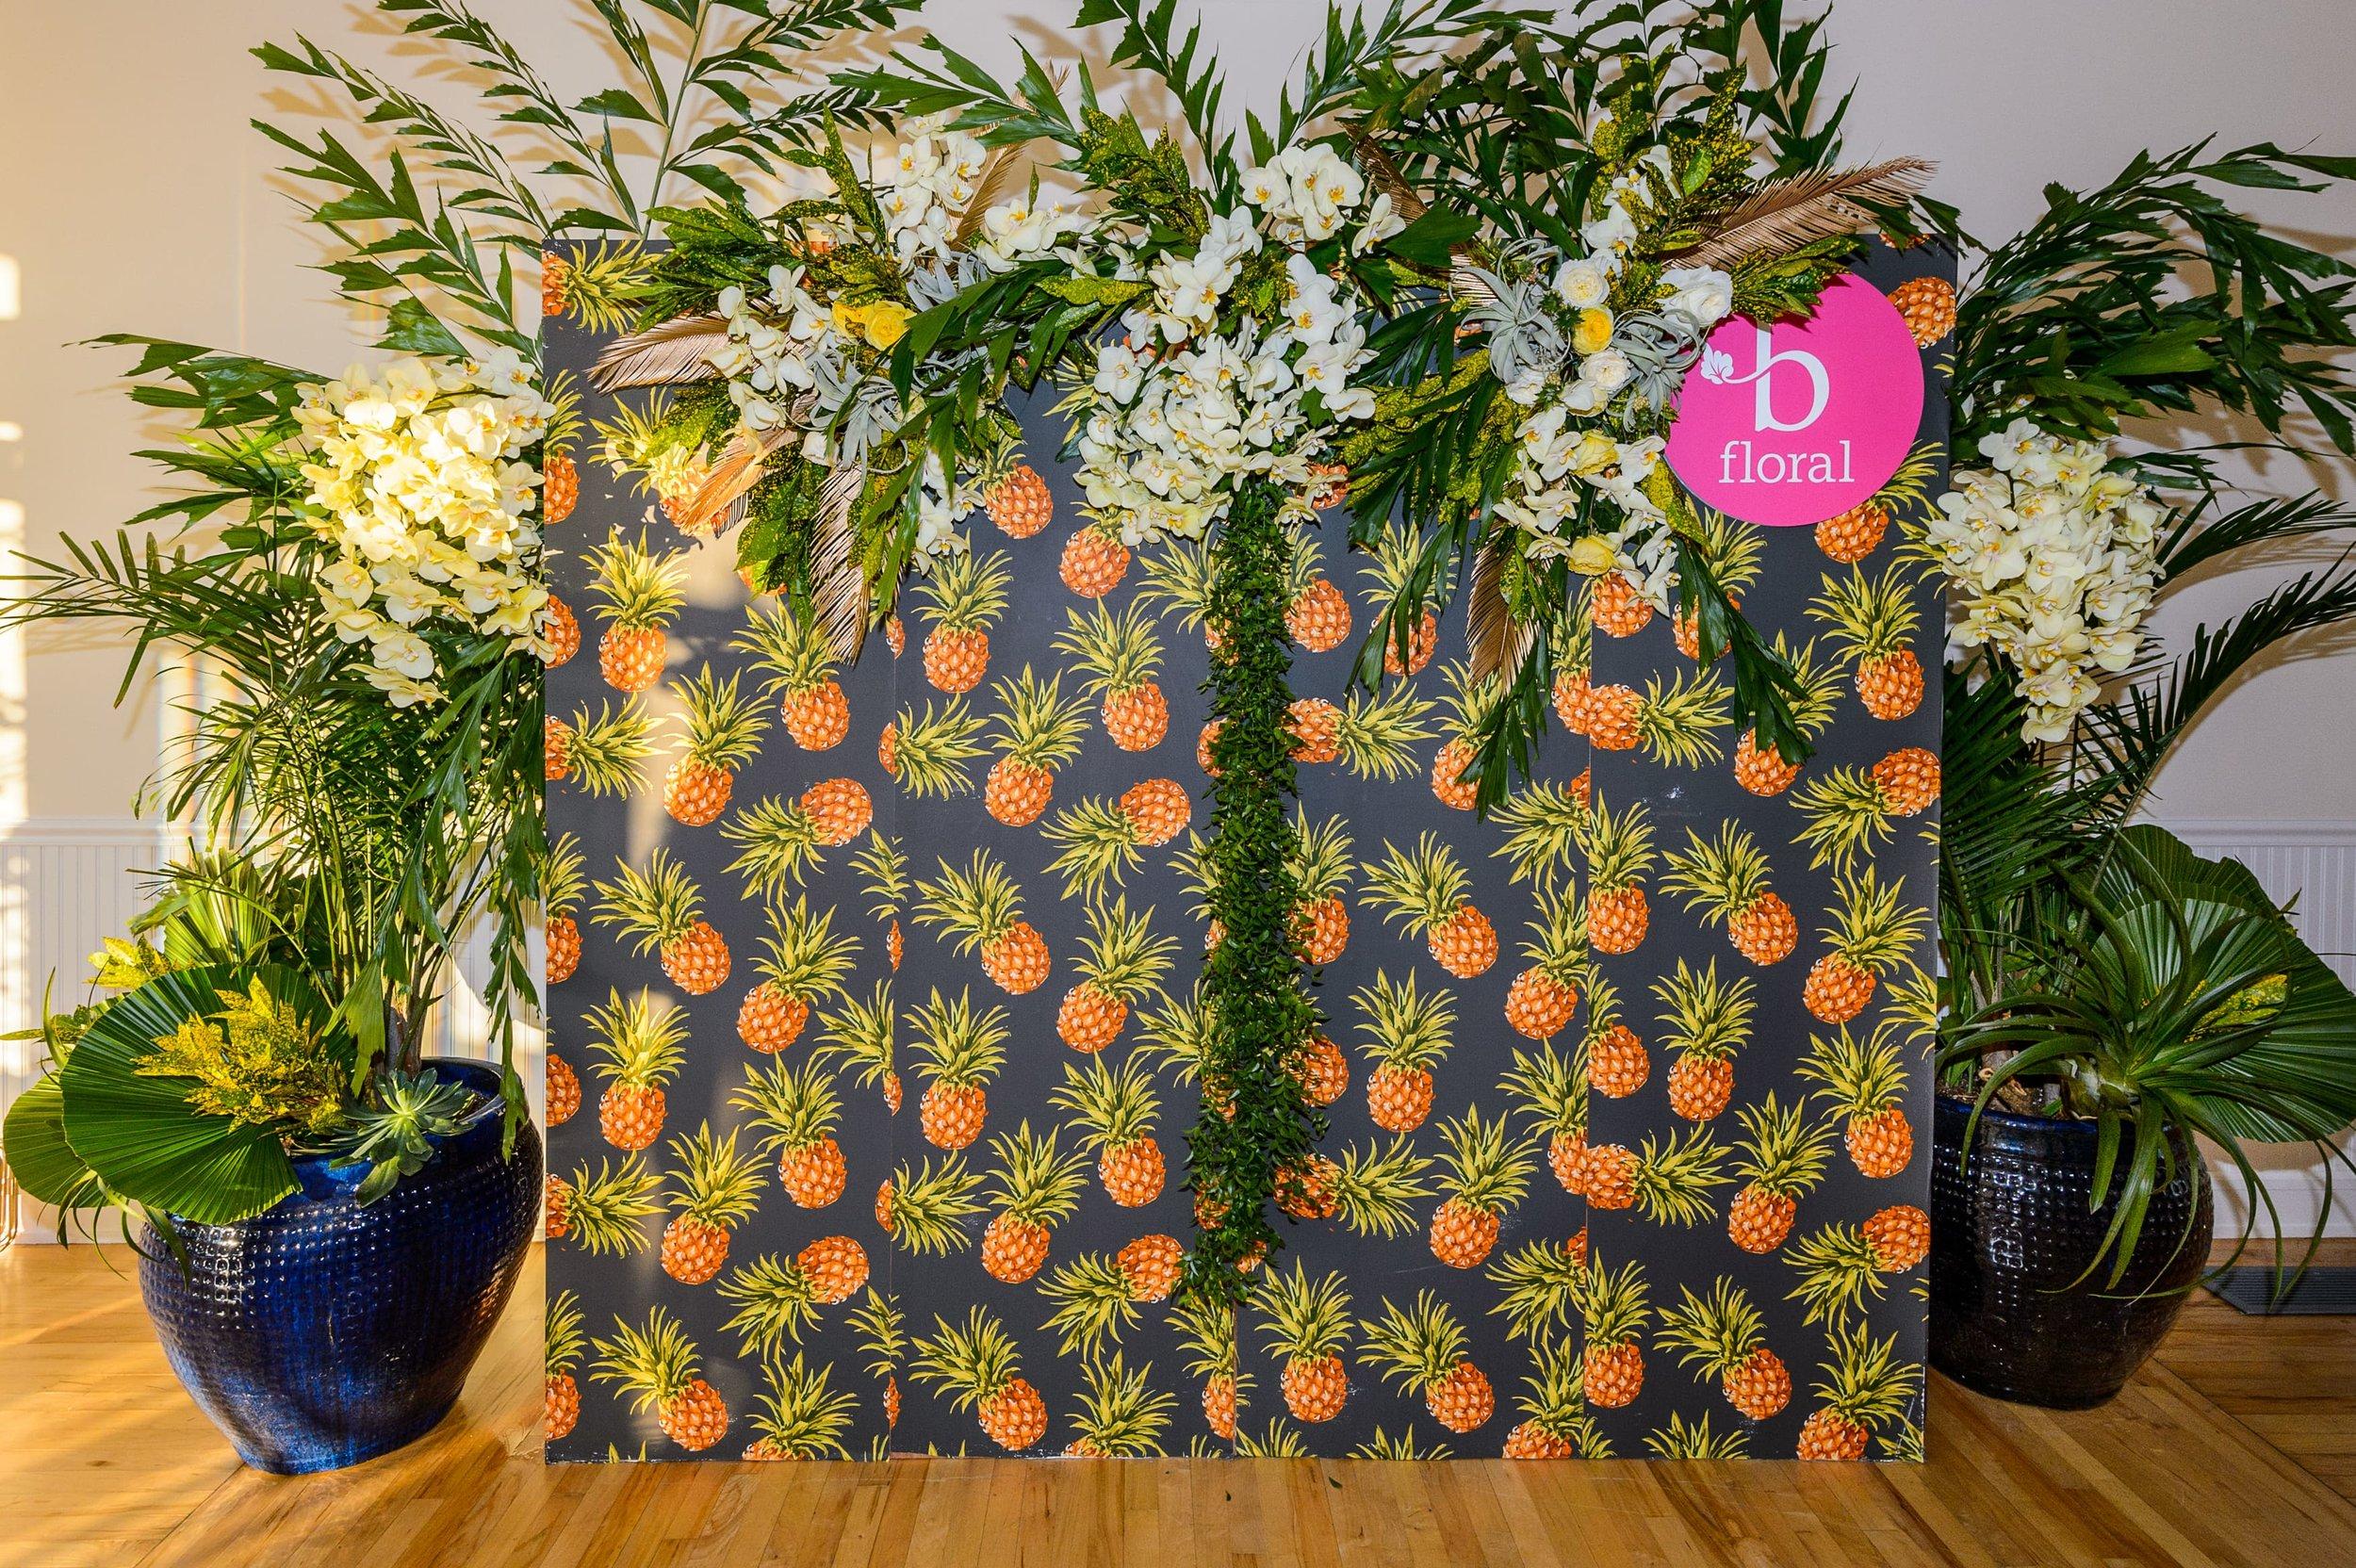 814eb-floralstepandrepeat-bfloralfloralstepandrepeat-bfloral.jpg